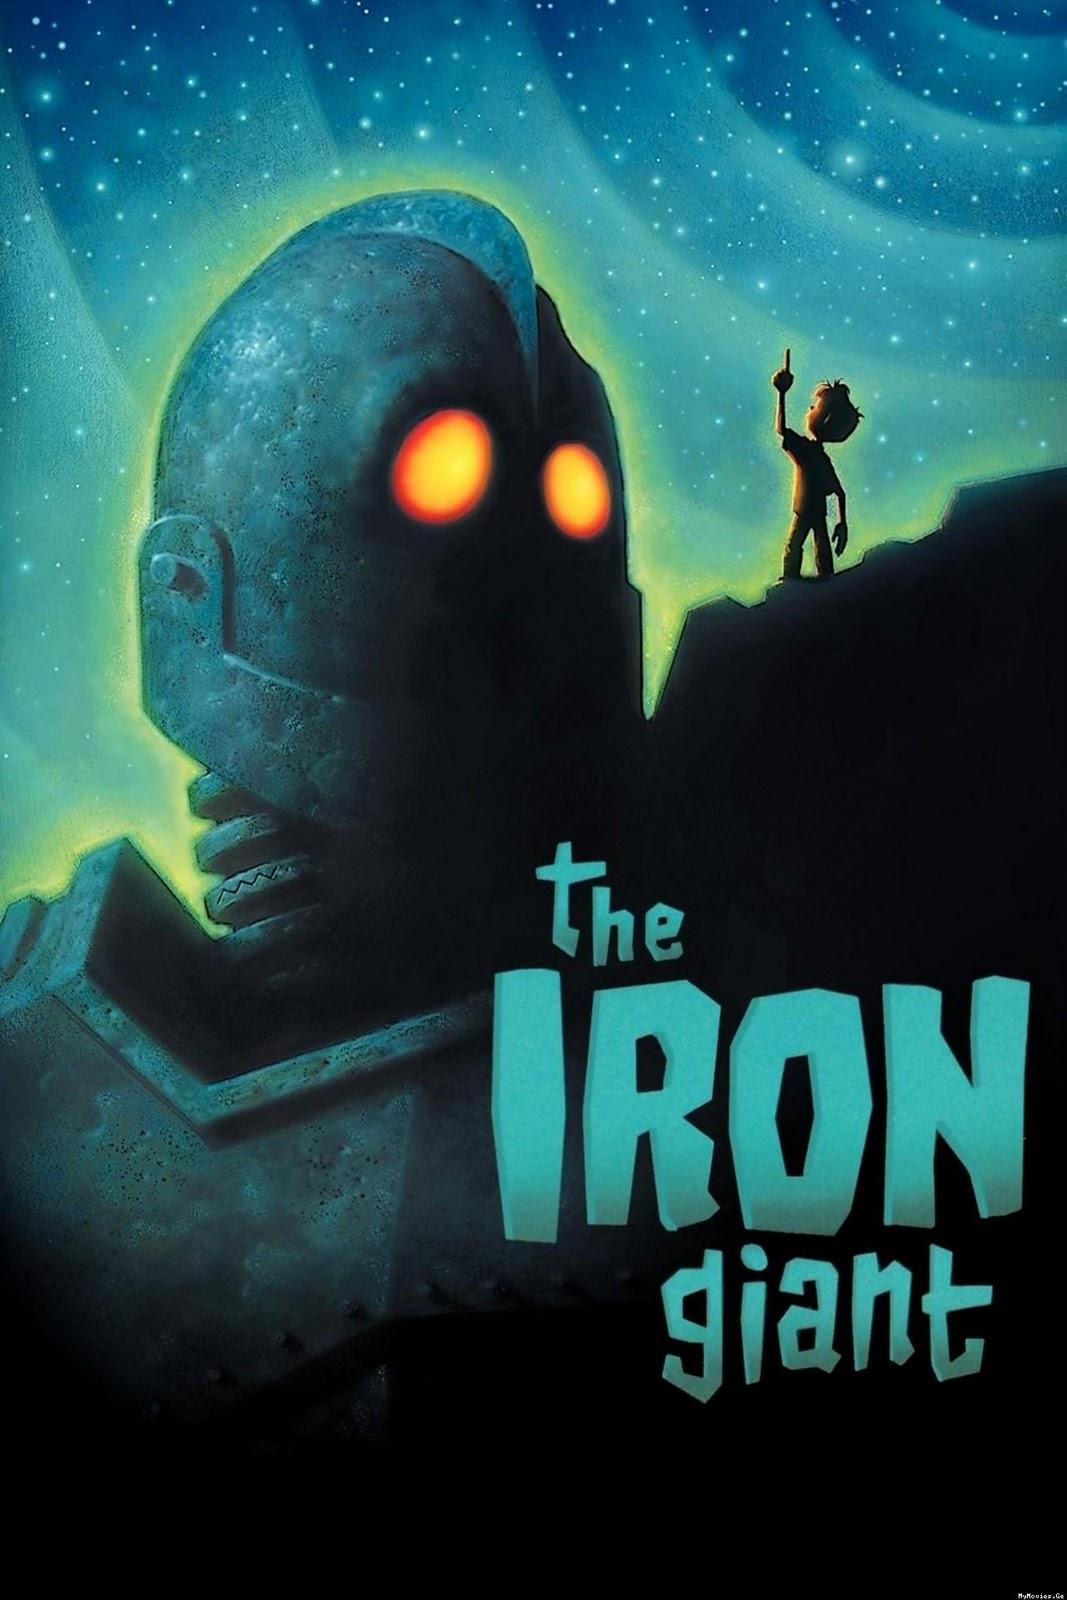 Iron Giant poster.jpg